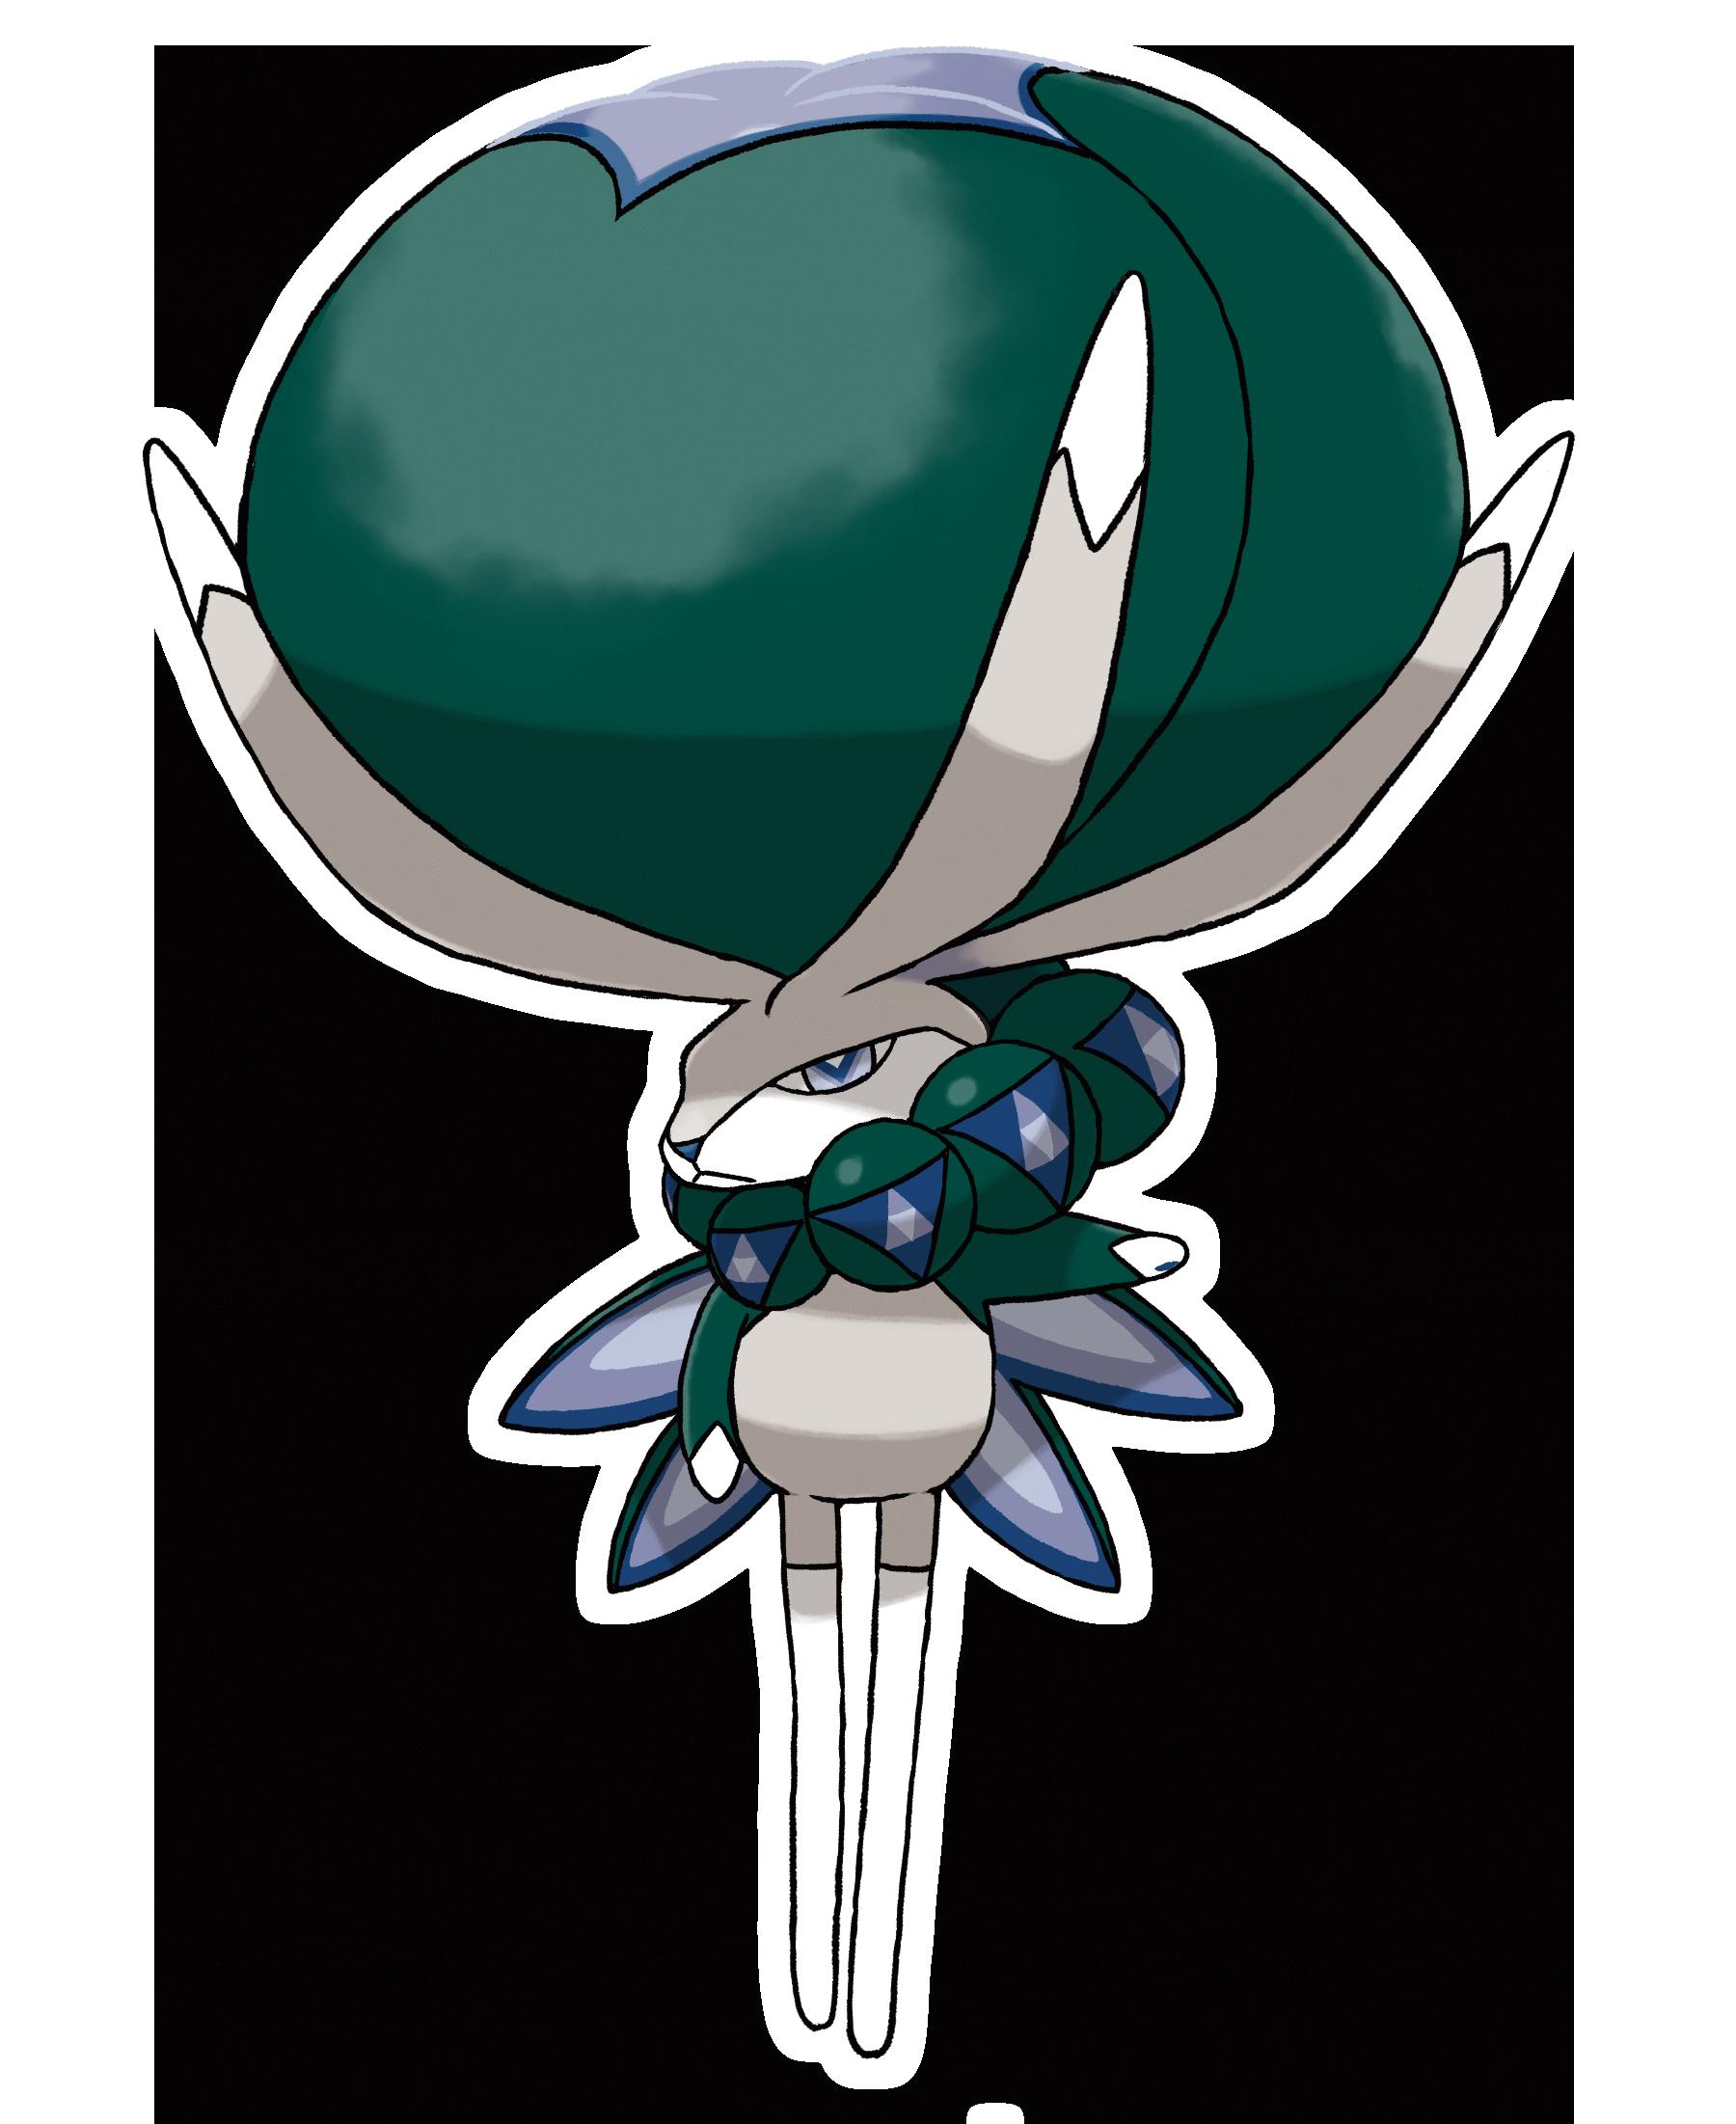 Pokemon-Sword-and-Shield_2020_01-09-20_035